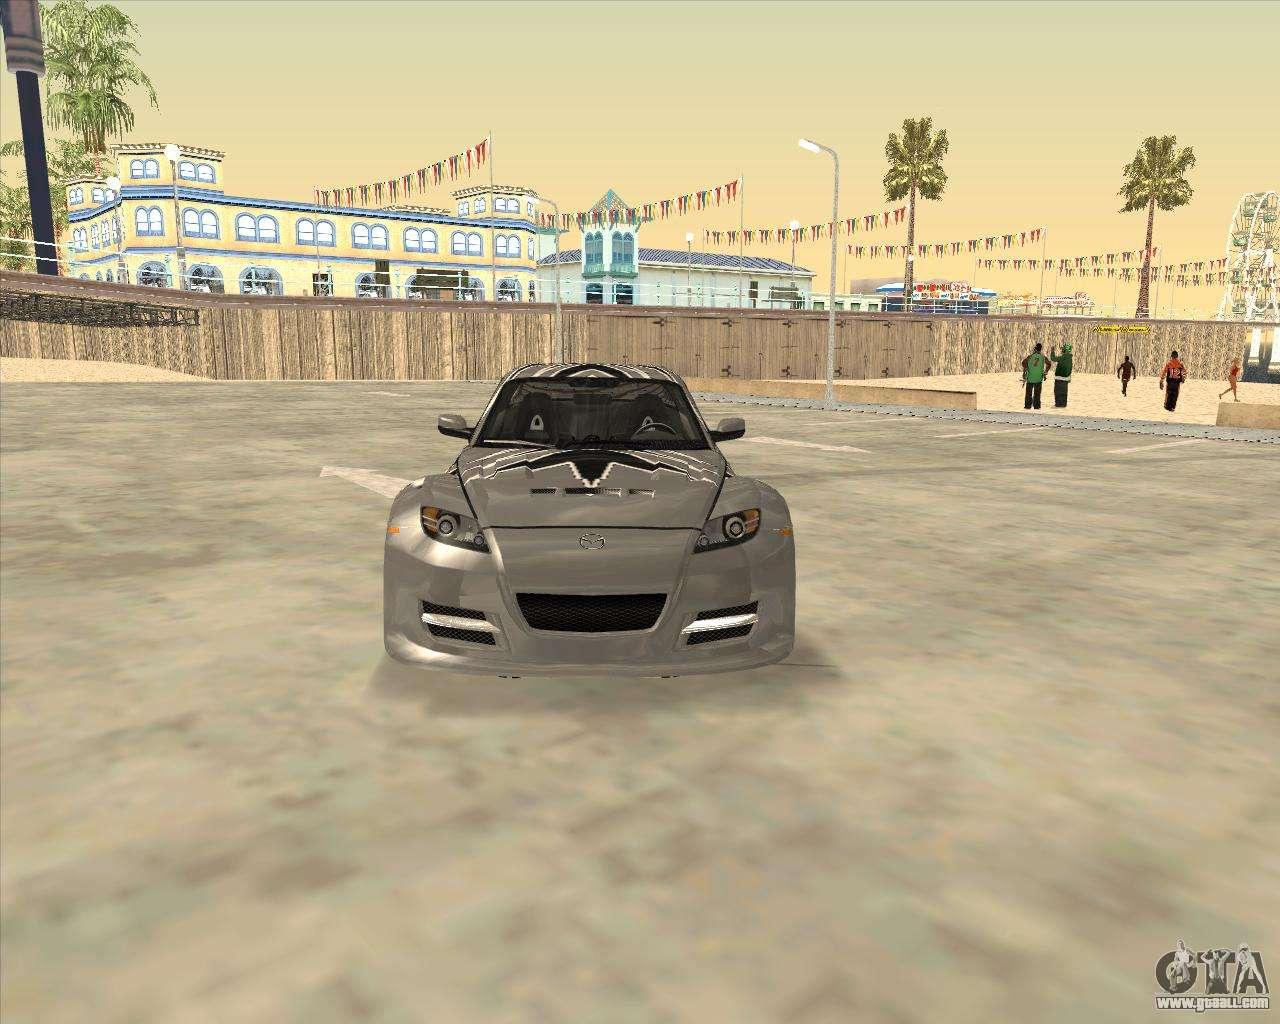 5700 Mod Mobil Most Wanted Gta San Andreas HD Terbaik